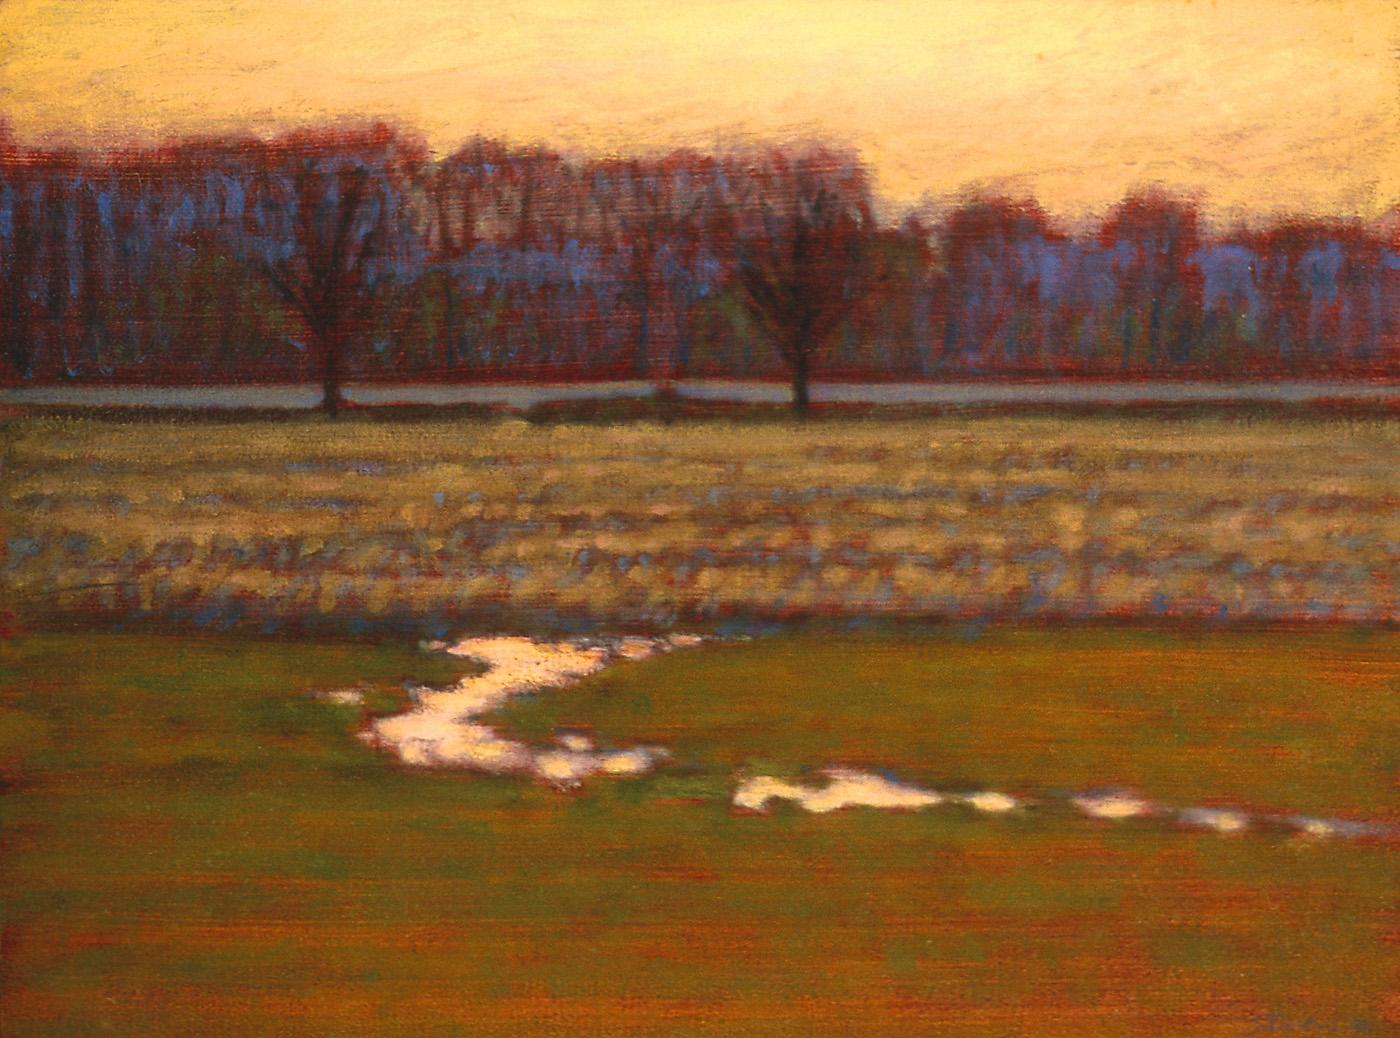 "Cornfield at Twilight   oil on panel   12 x 16""   1996"